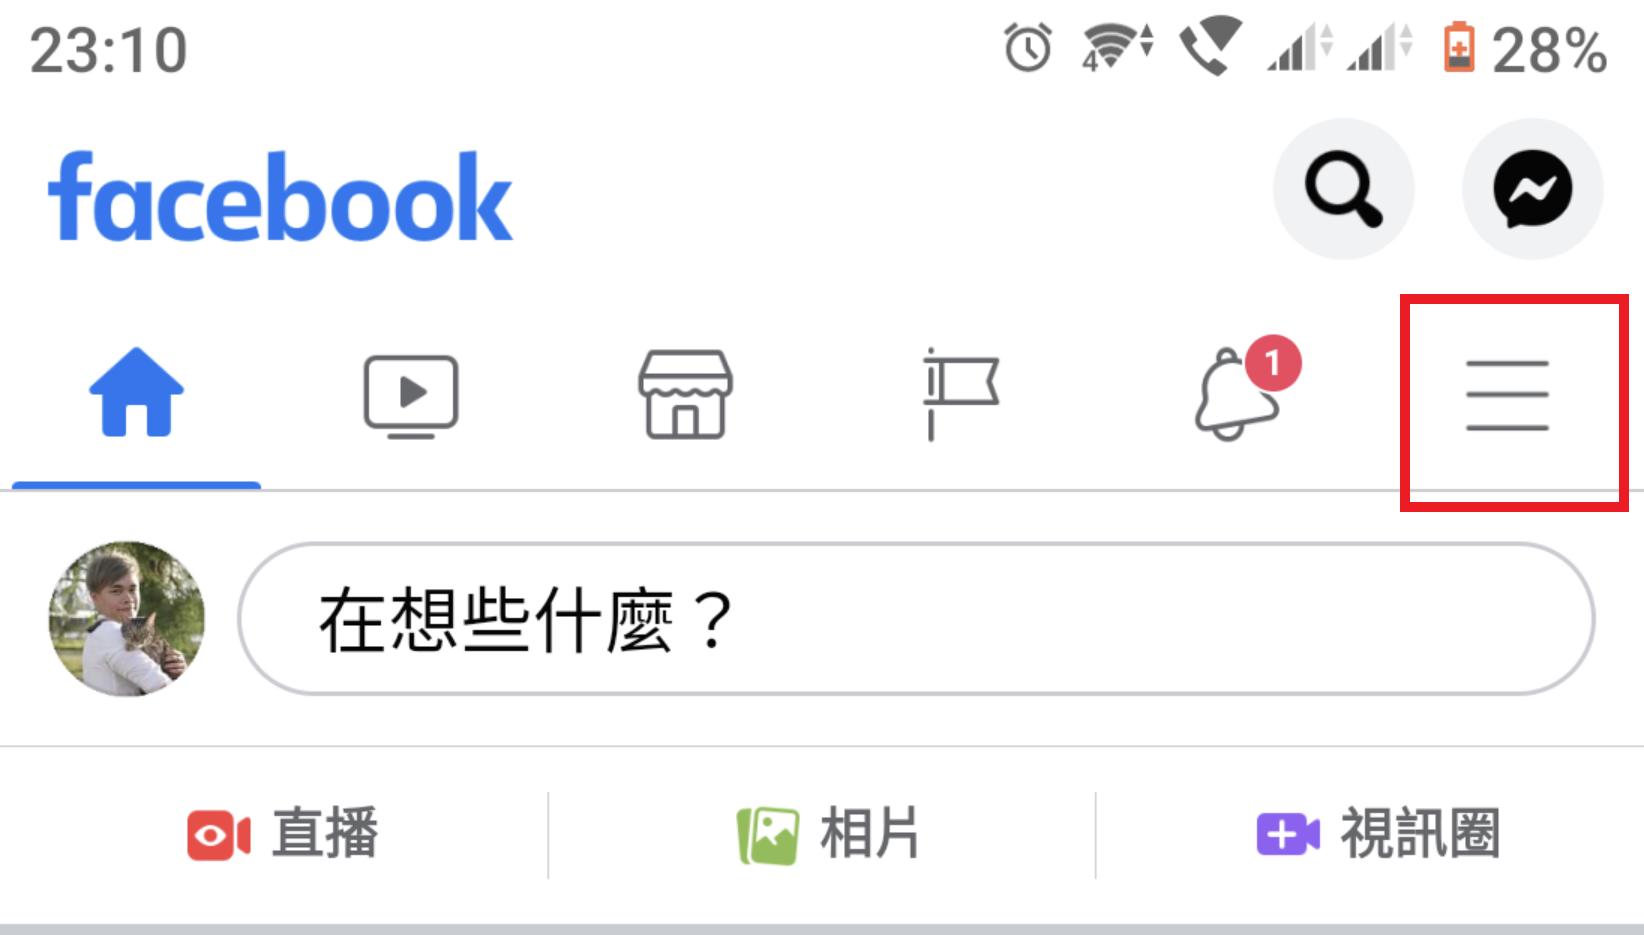 Facebook 新功能,帶你製作屬於自己的虛擬替身